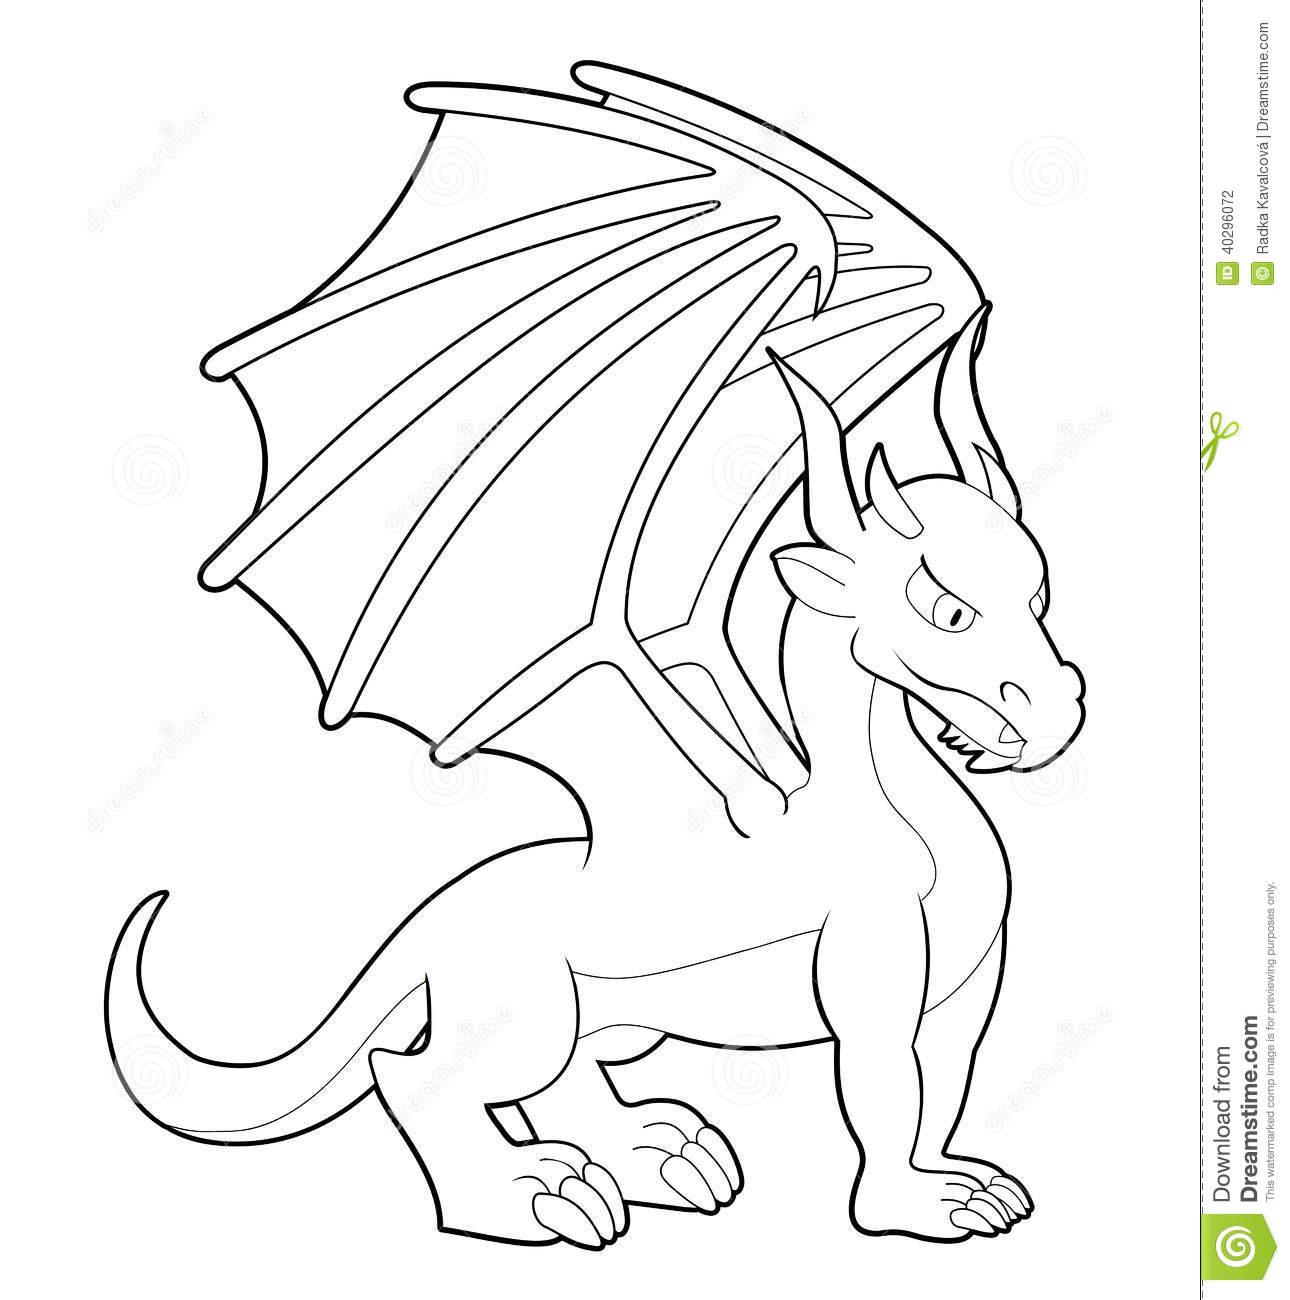 1290x1300 Cartoon Dragon Drawing How To Draw A Flying Dragon, Dragon